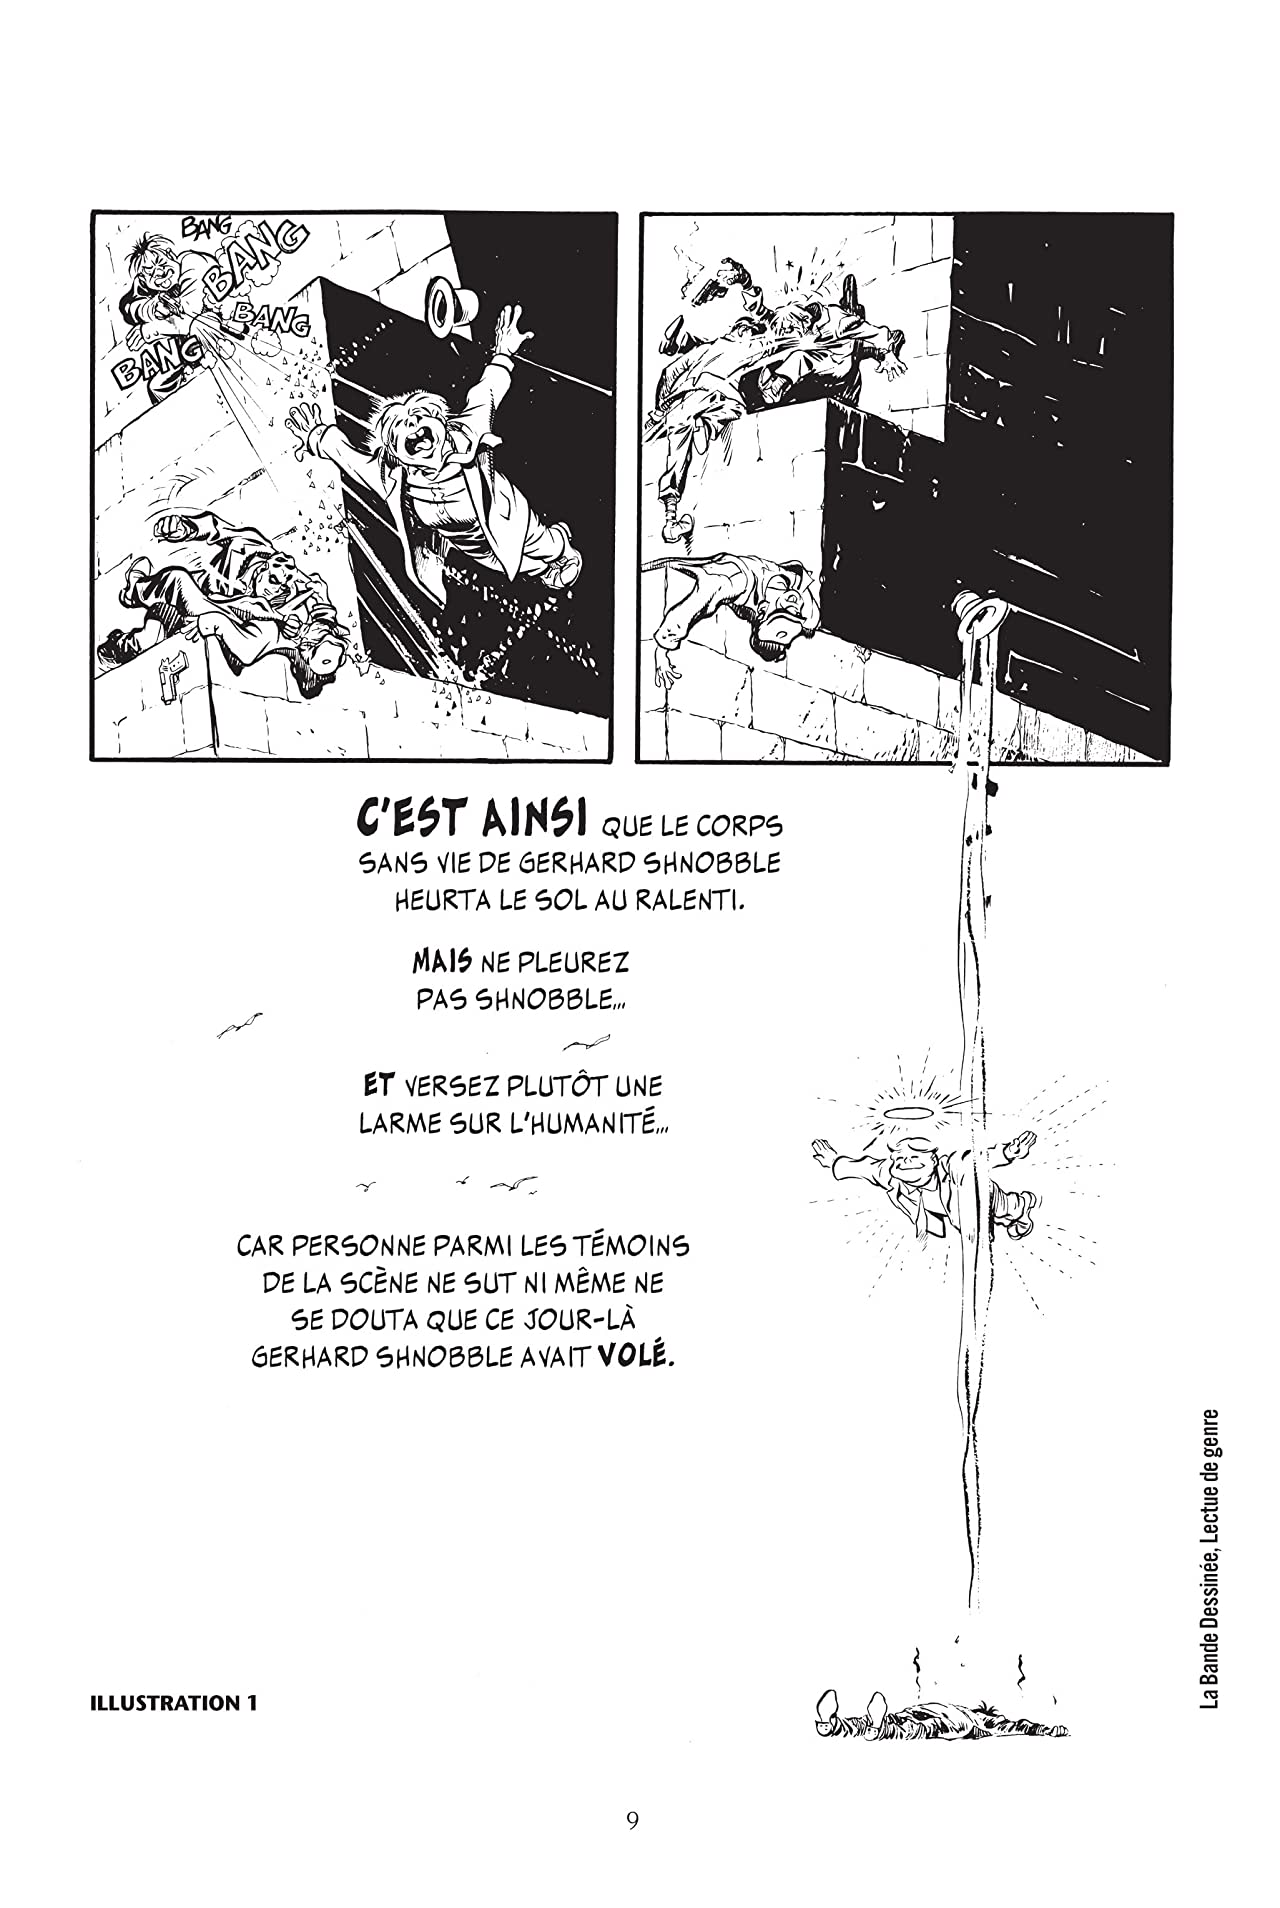 Les Clés de la bande dessinée Vol. 1: L'Art séquentiel